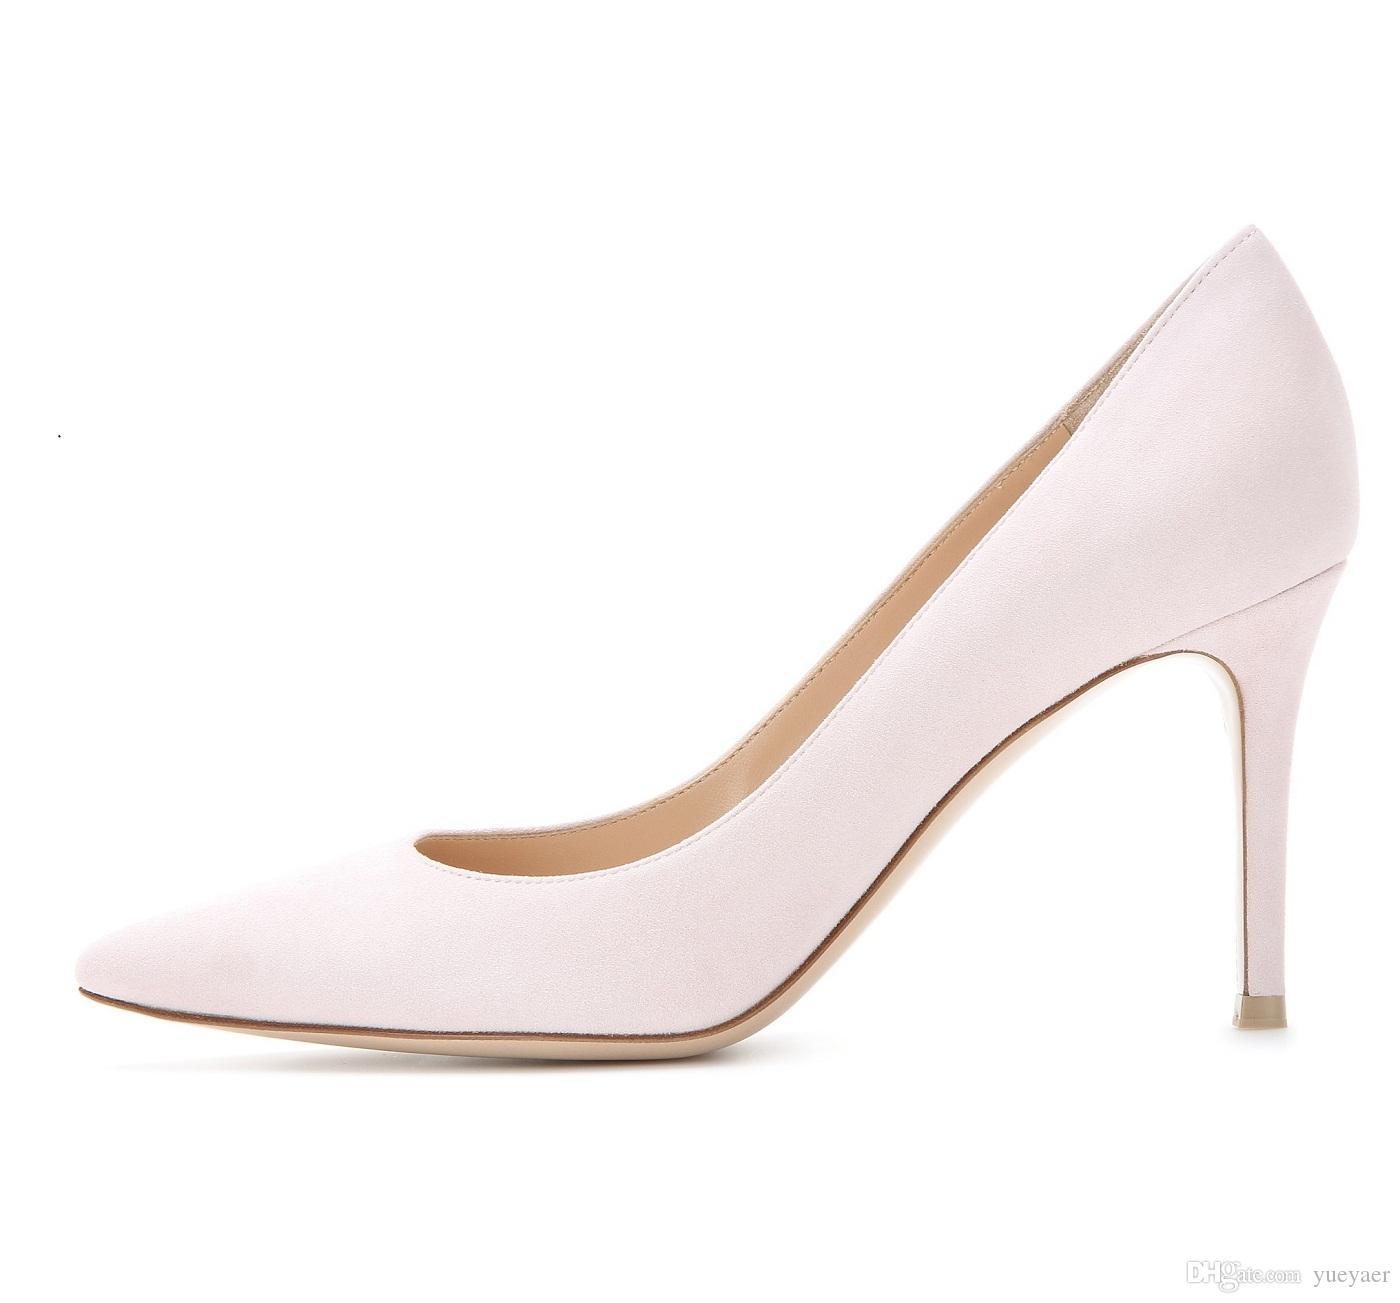 Zandina Handmade Fashion 8cm High Heel Pumps Simple Style Slip-on Pointy Party Evening Wedding Stiletto Shoes Pink K361